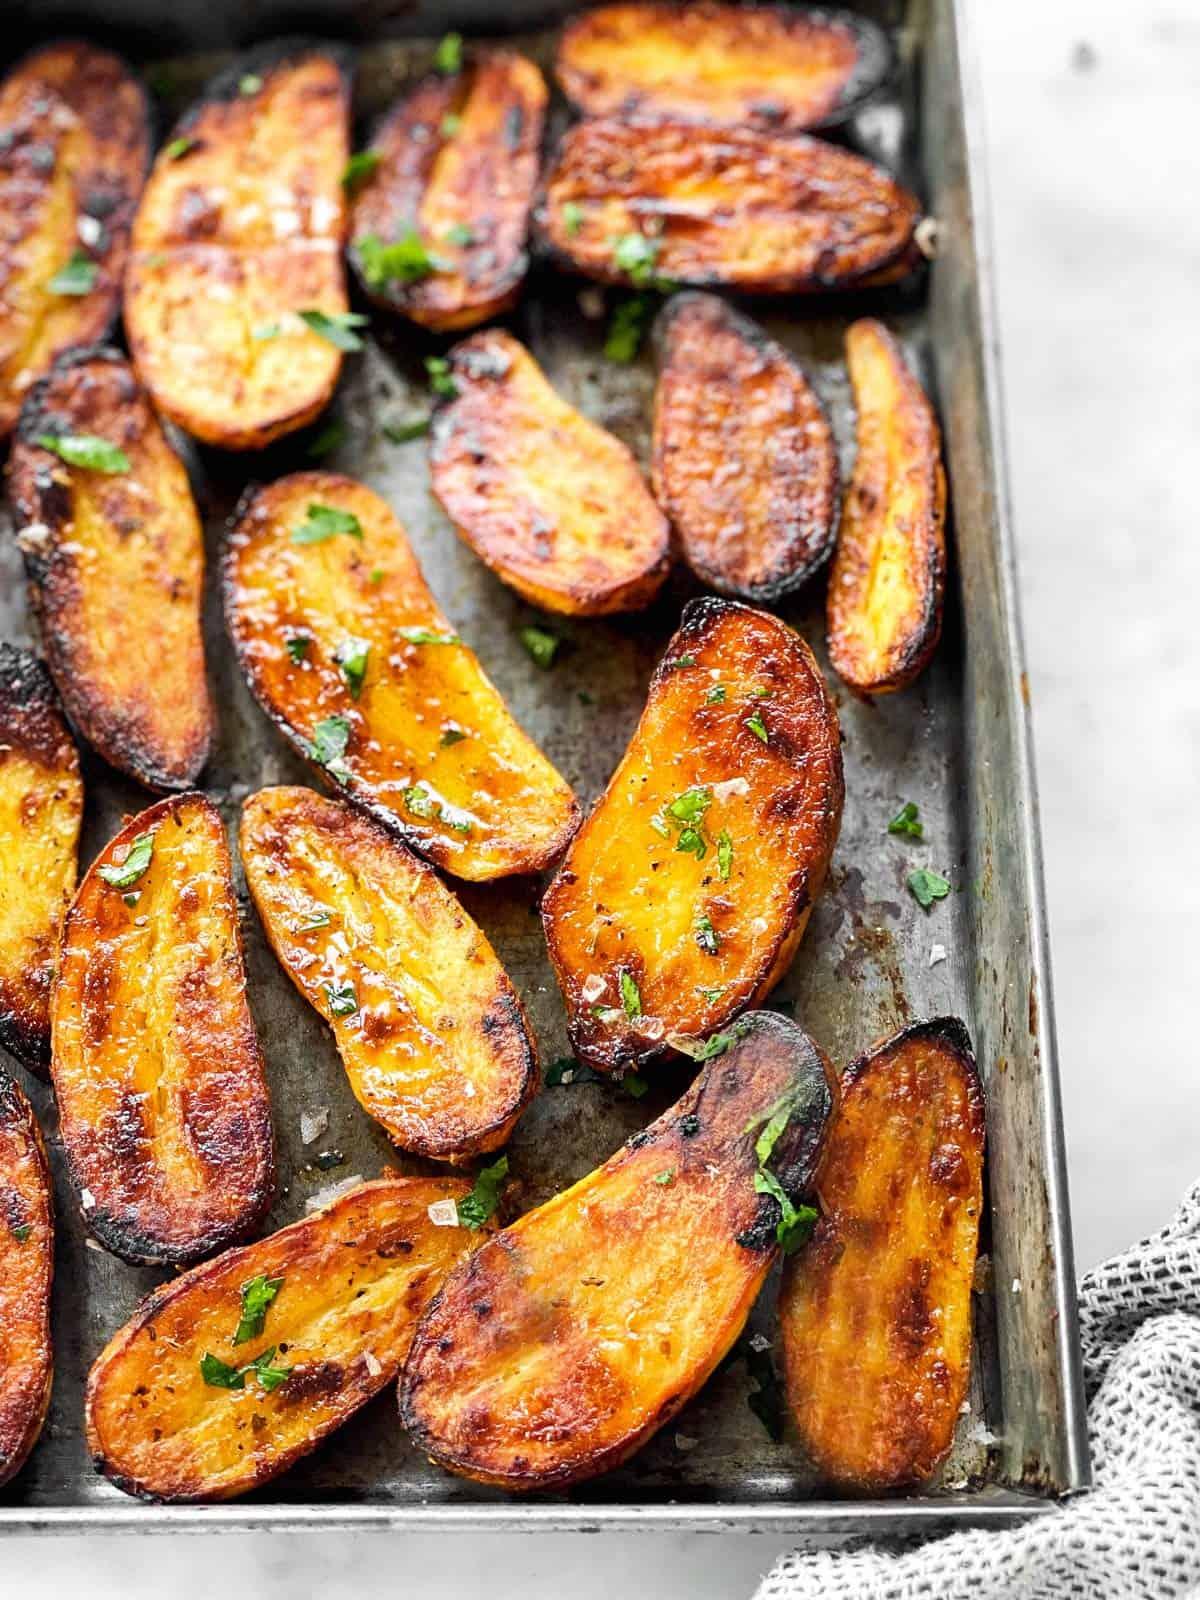 roasted fingerling potatoes on a metal pan